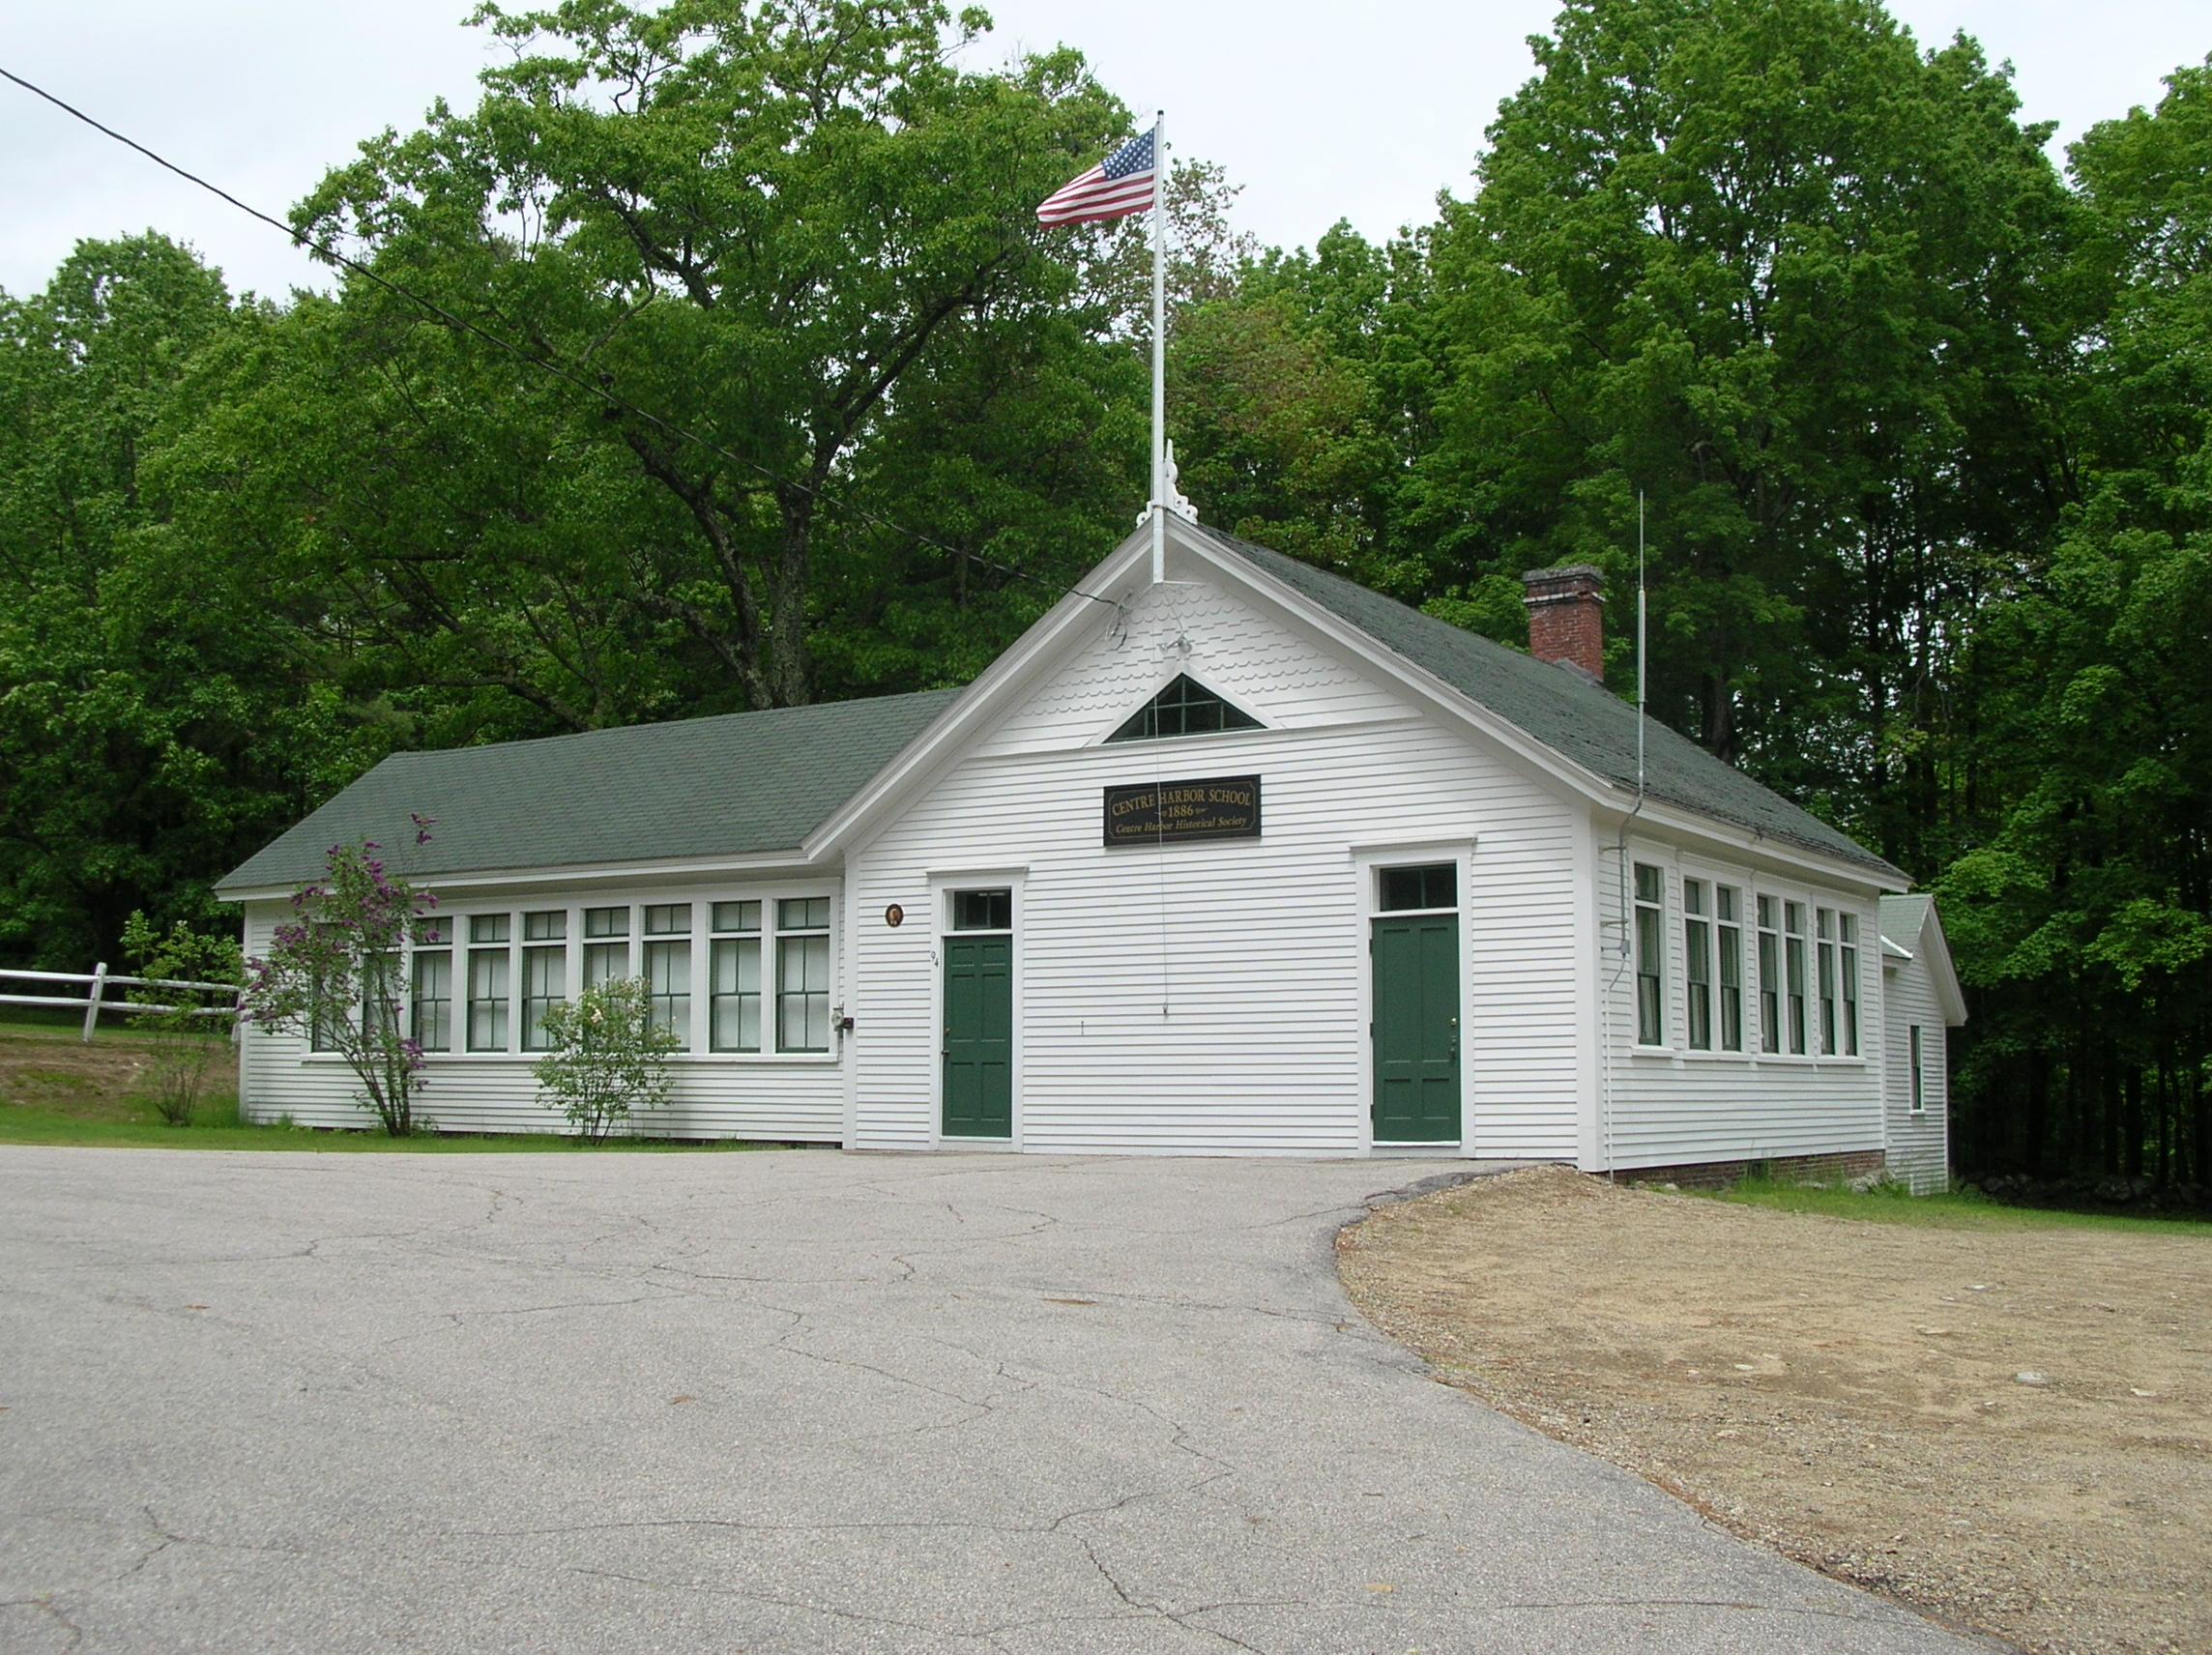 1886 Village Schoolhouse